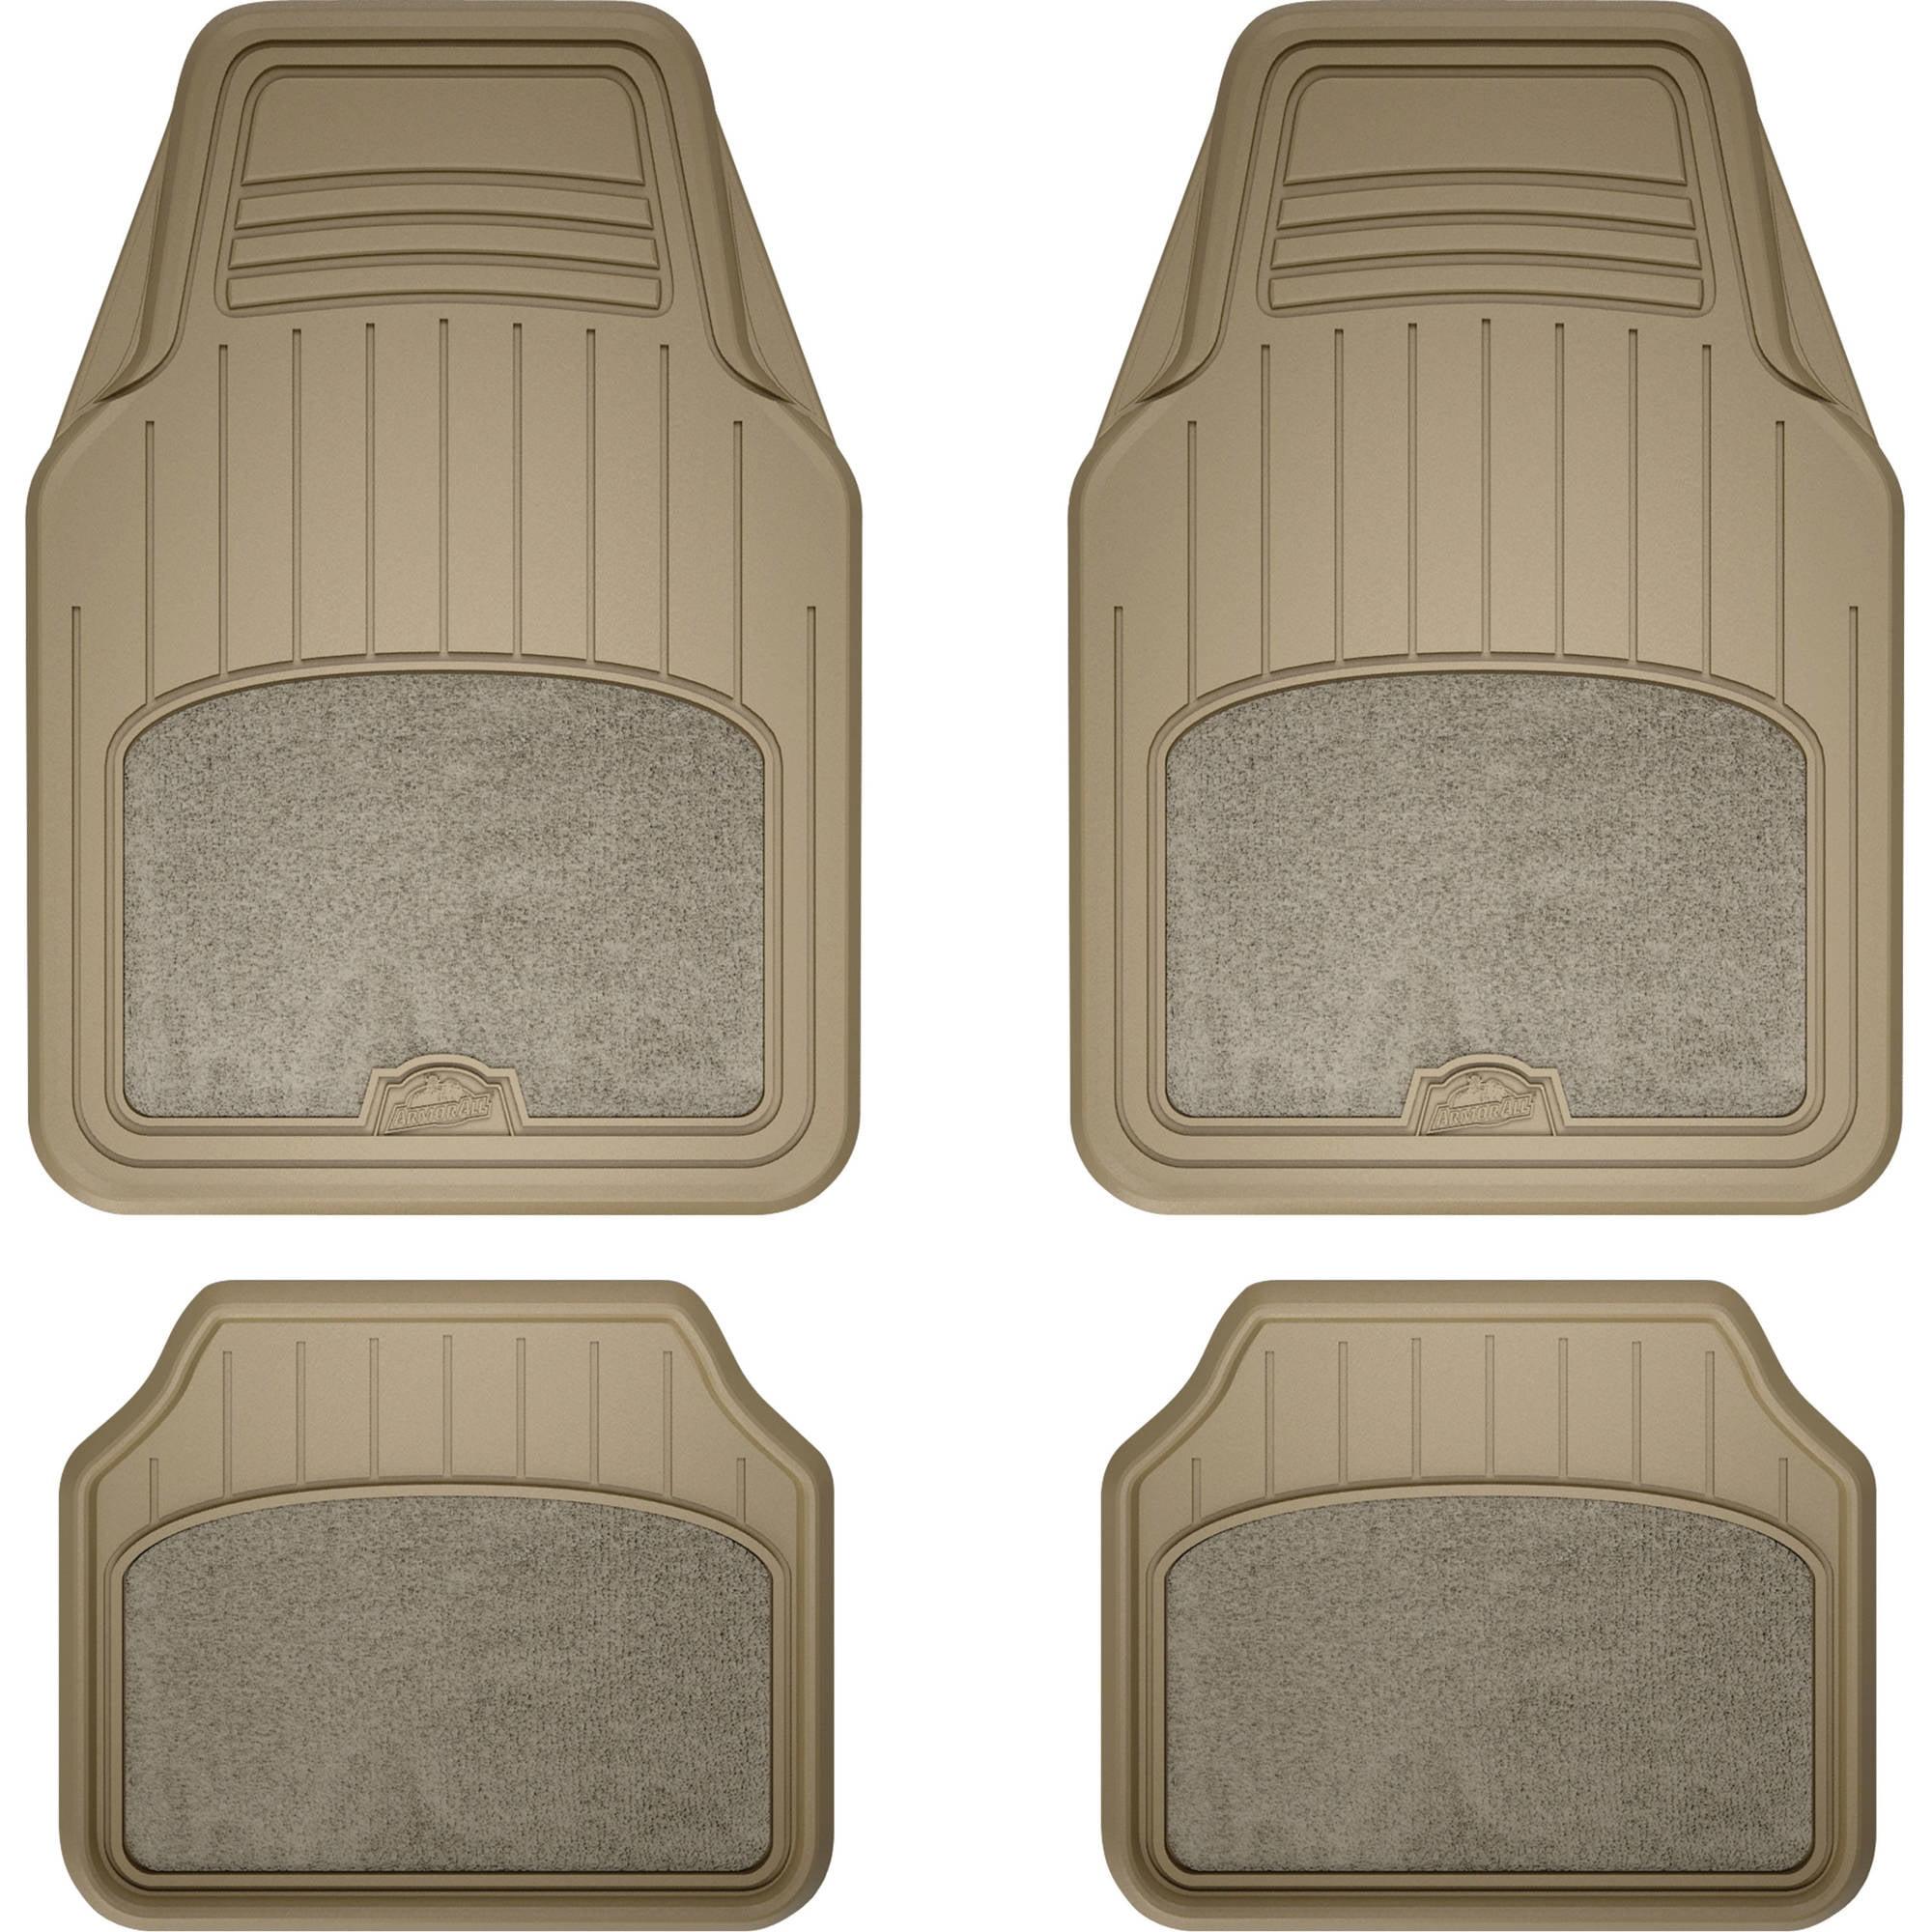 Armor All 78892 4-Piece Tan All Season Carpet /& Rubber Floor Mat